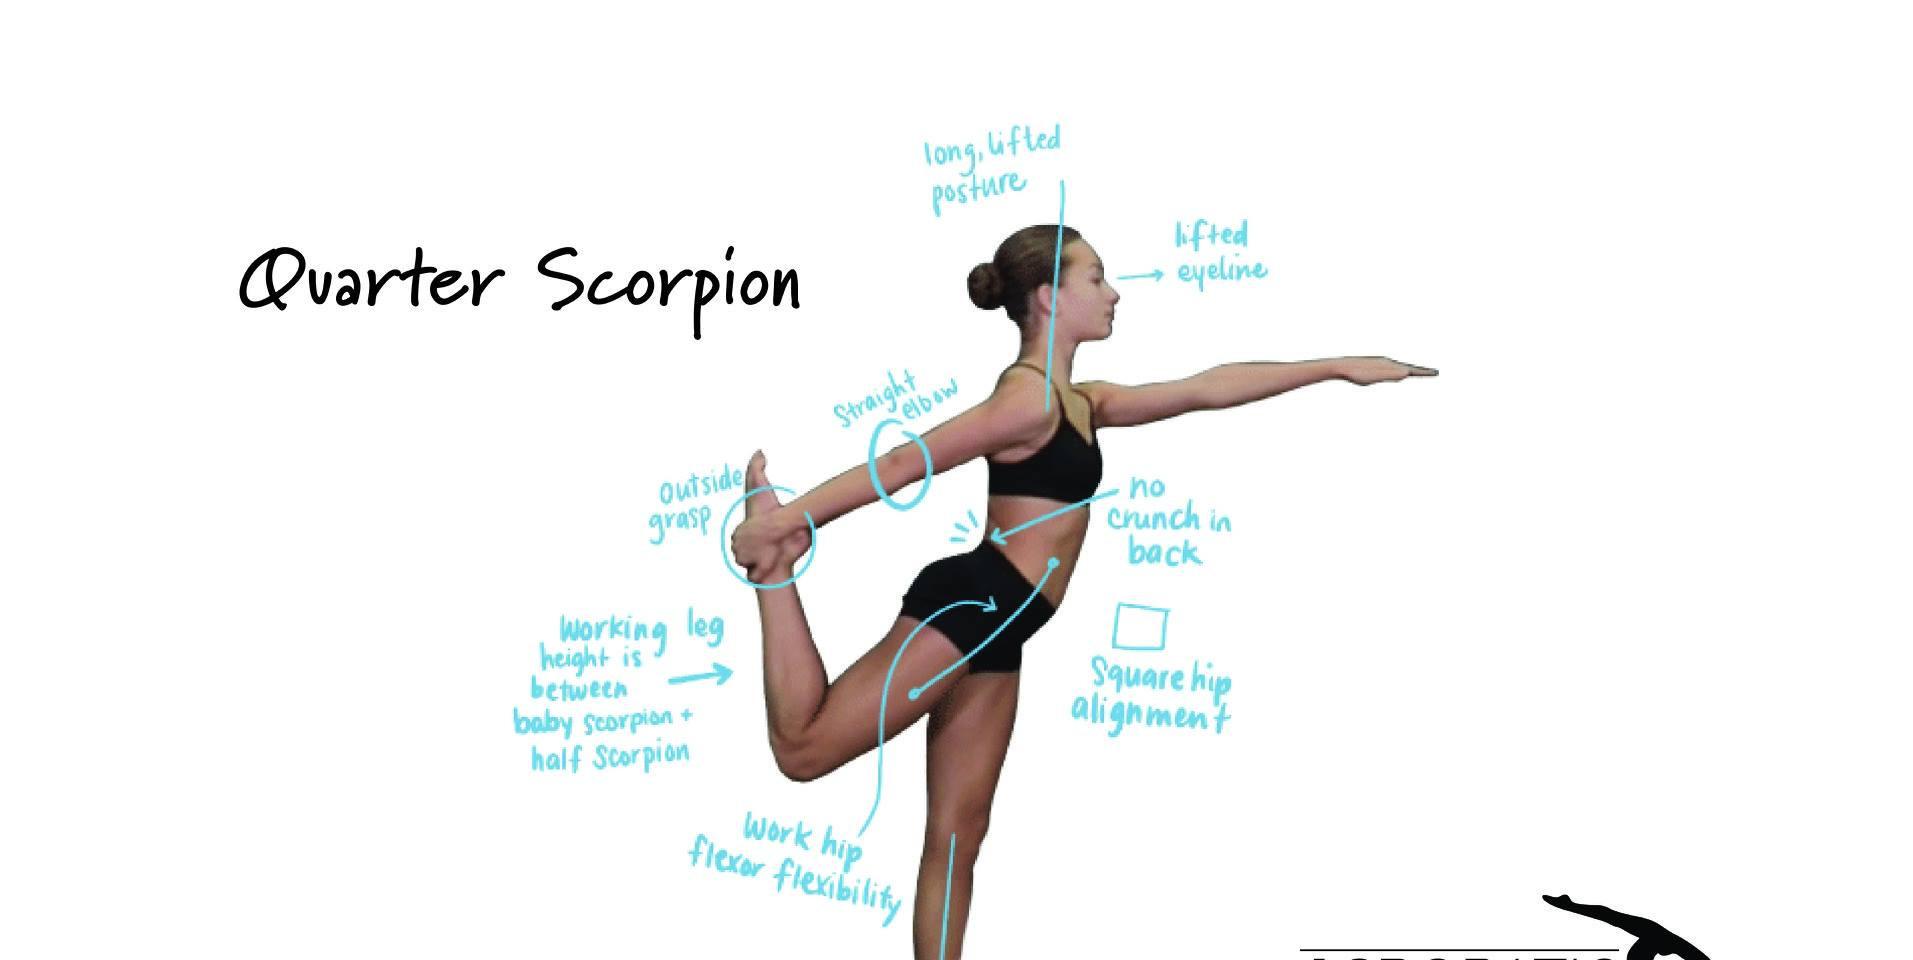 Quarter scorpion.jpg